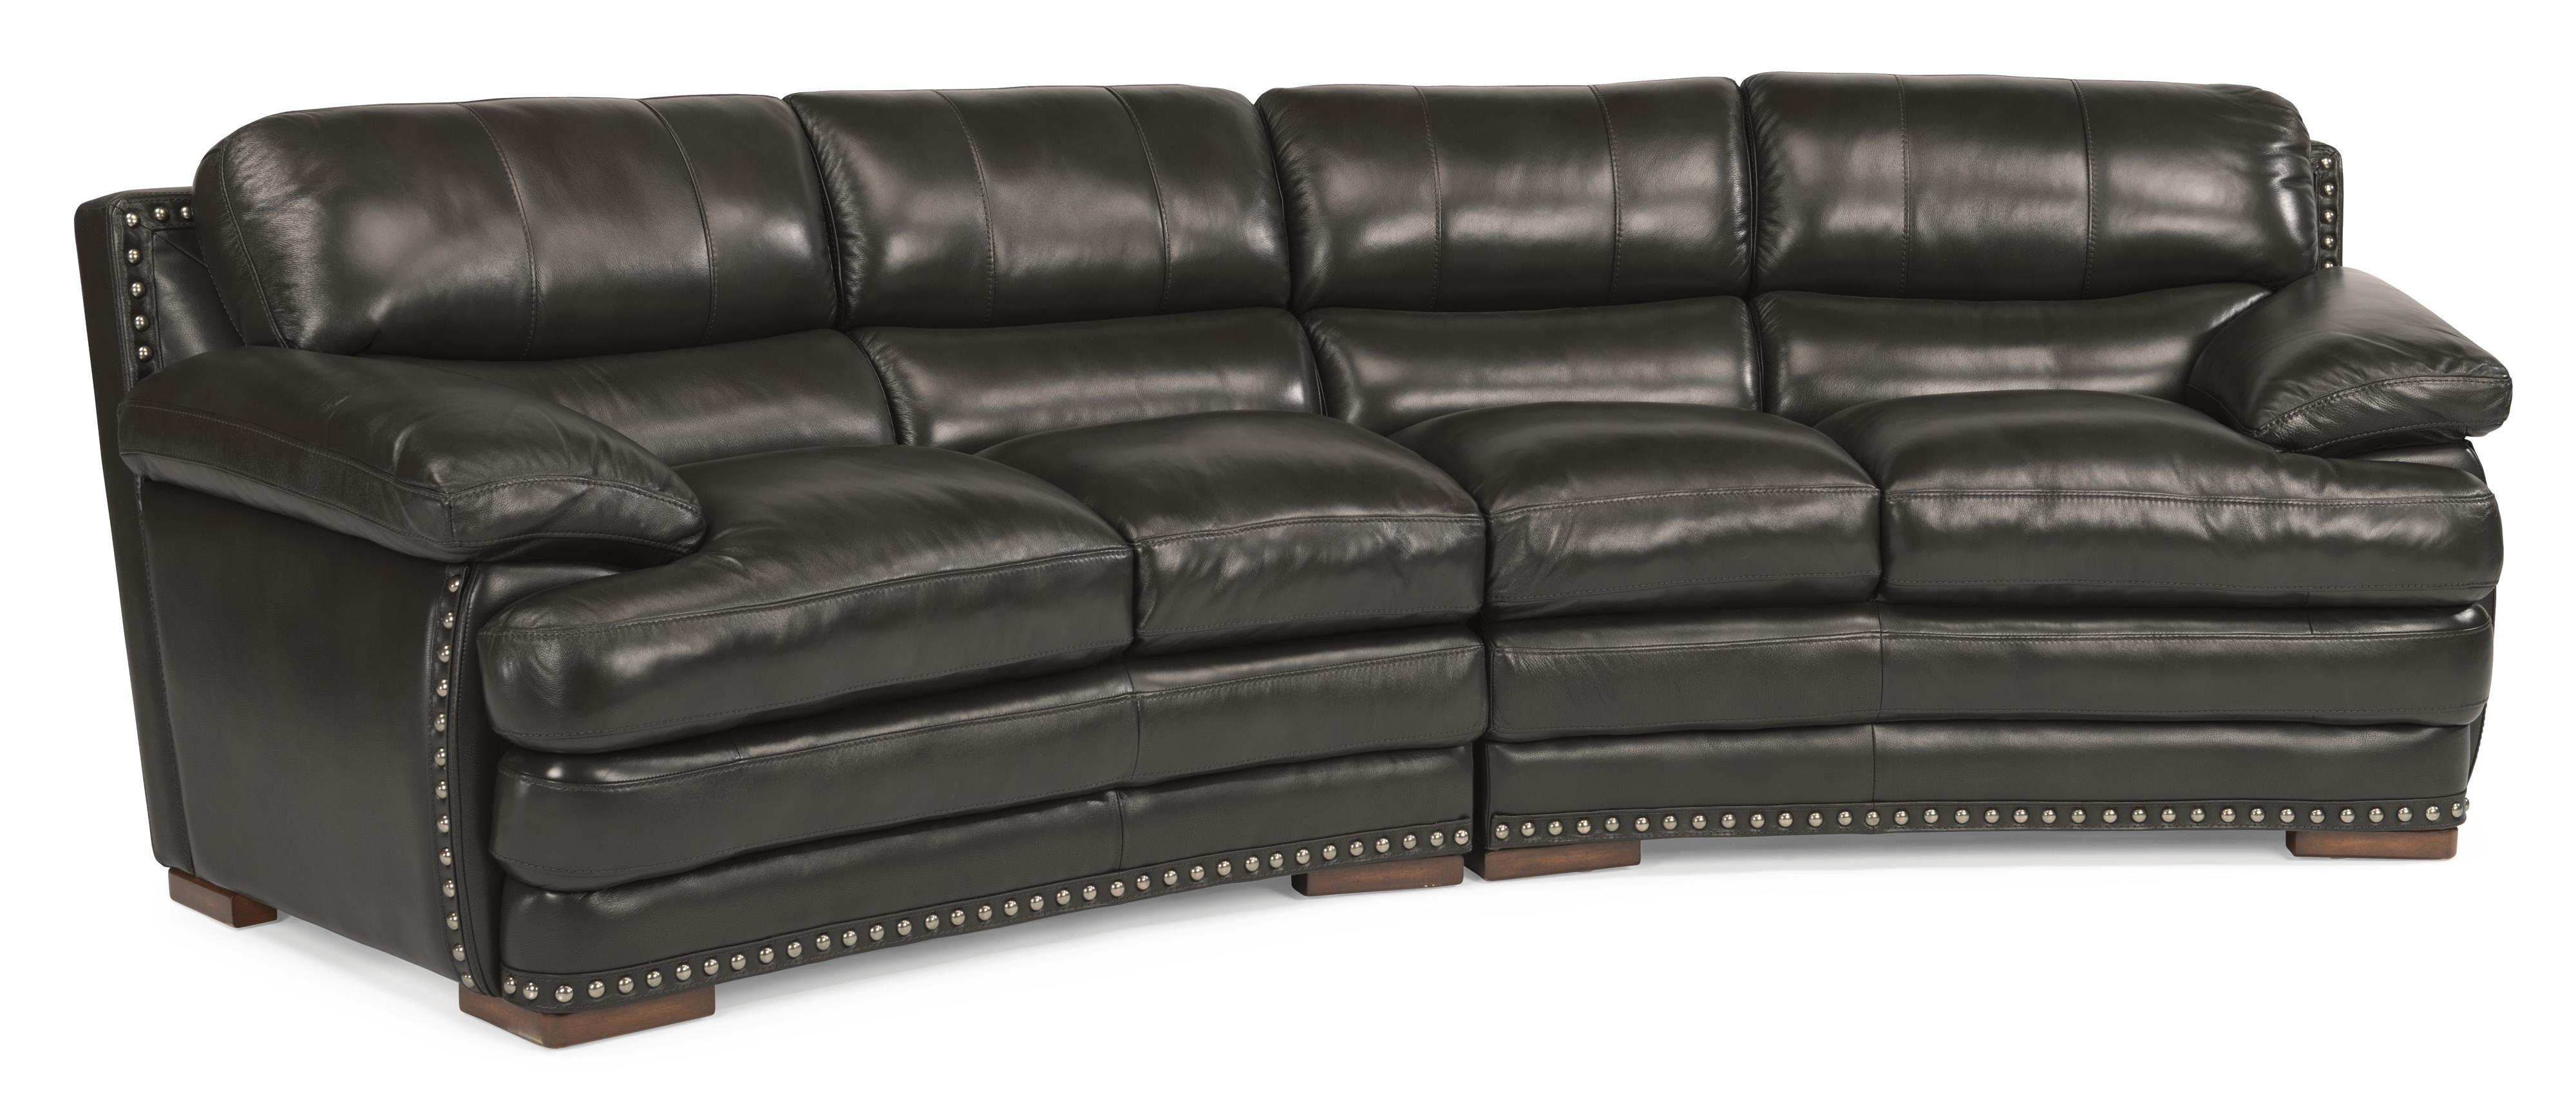 Flexsteel Latitudes Dylan Leather Conversation Sofa with  : products2Fflexsteel2Fcolor2Flatitudes20 20dylan1627 3252B326 908 01 b1 from www.wayside-furniture.com size 4000 x 1736 jpeg 448kB